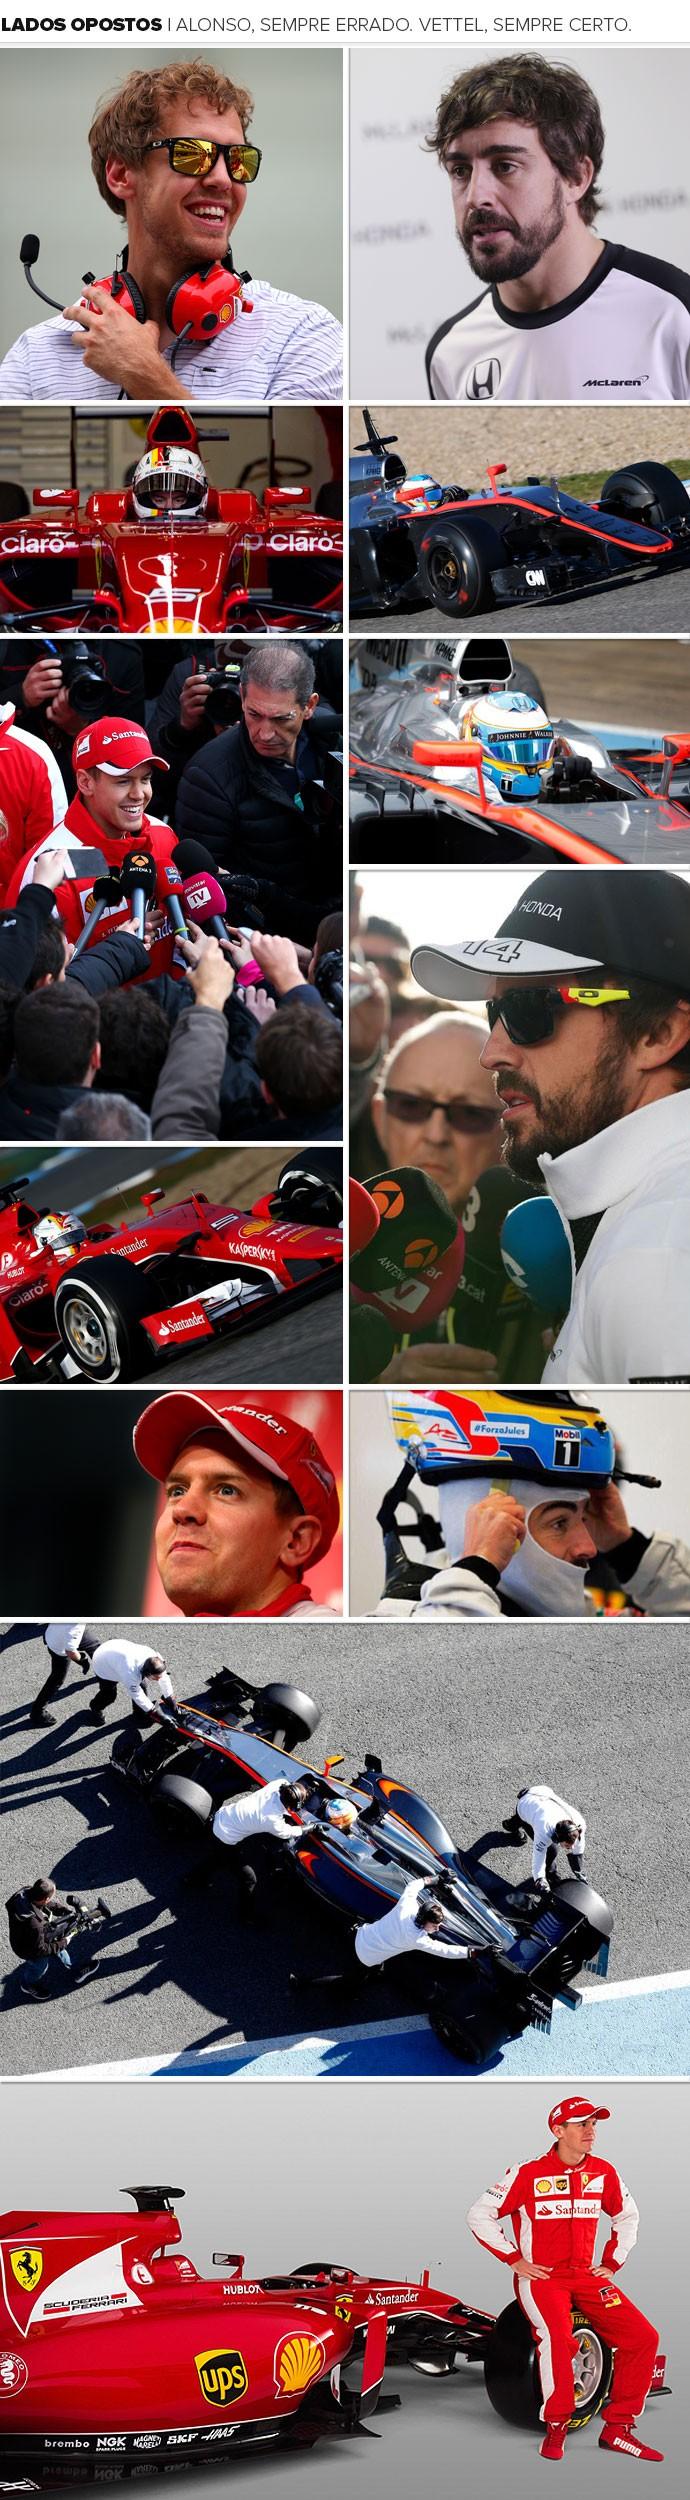 mosaico Vettel e Alonso (Foto: Montagem sobre foto da Getty Images)